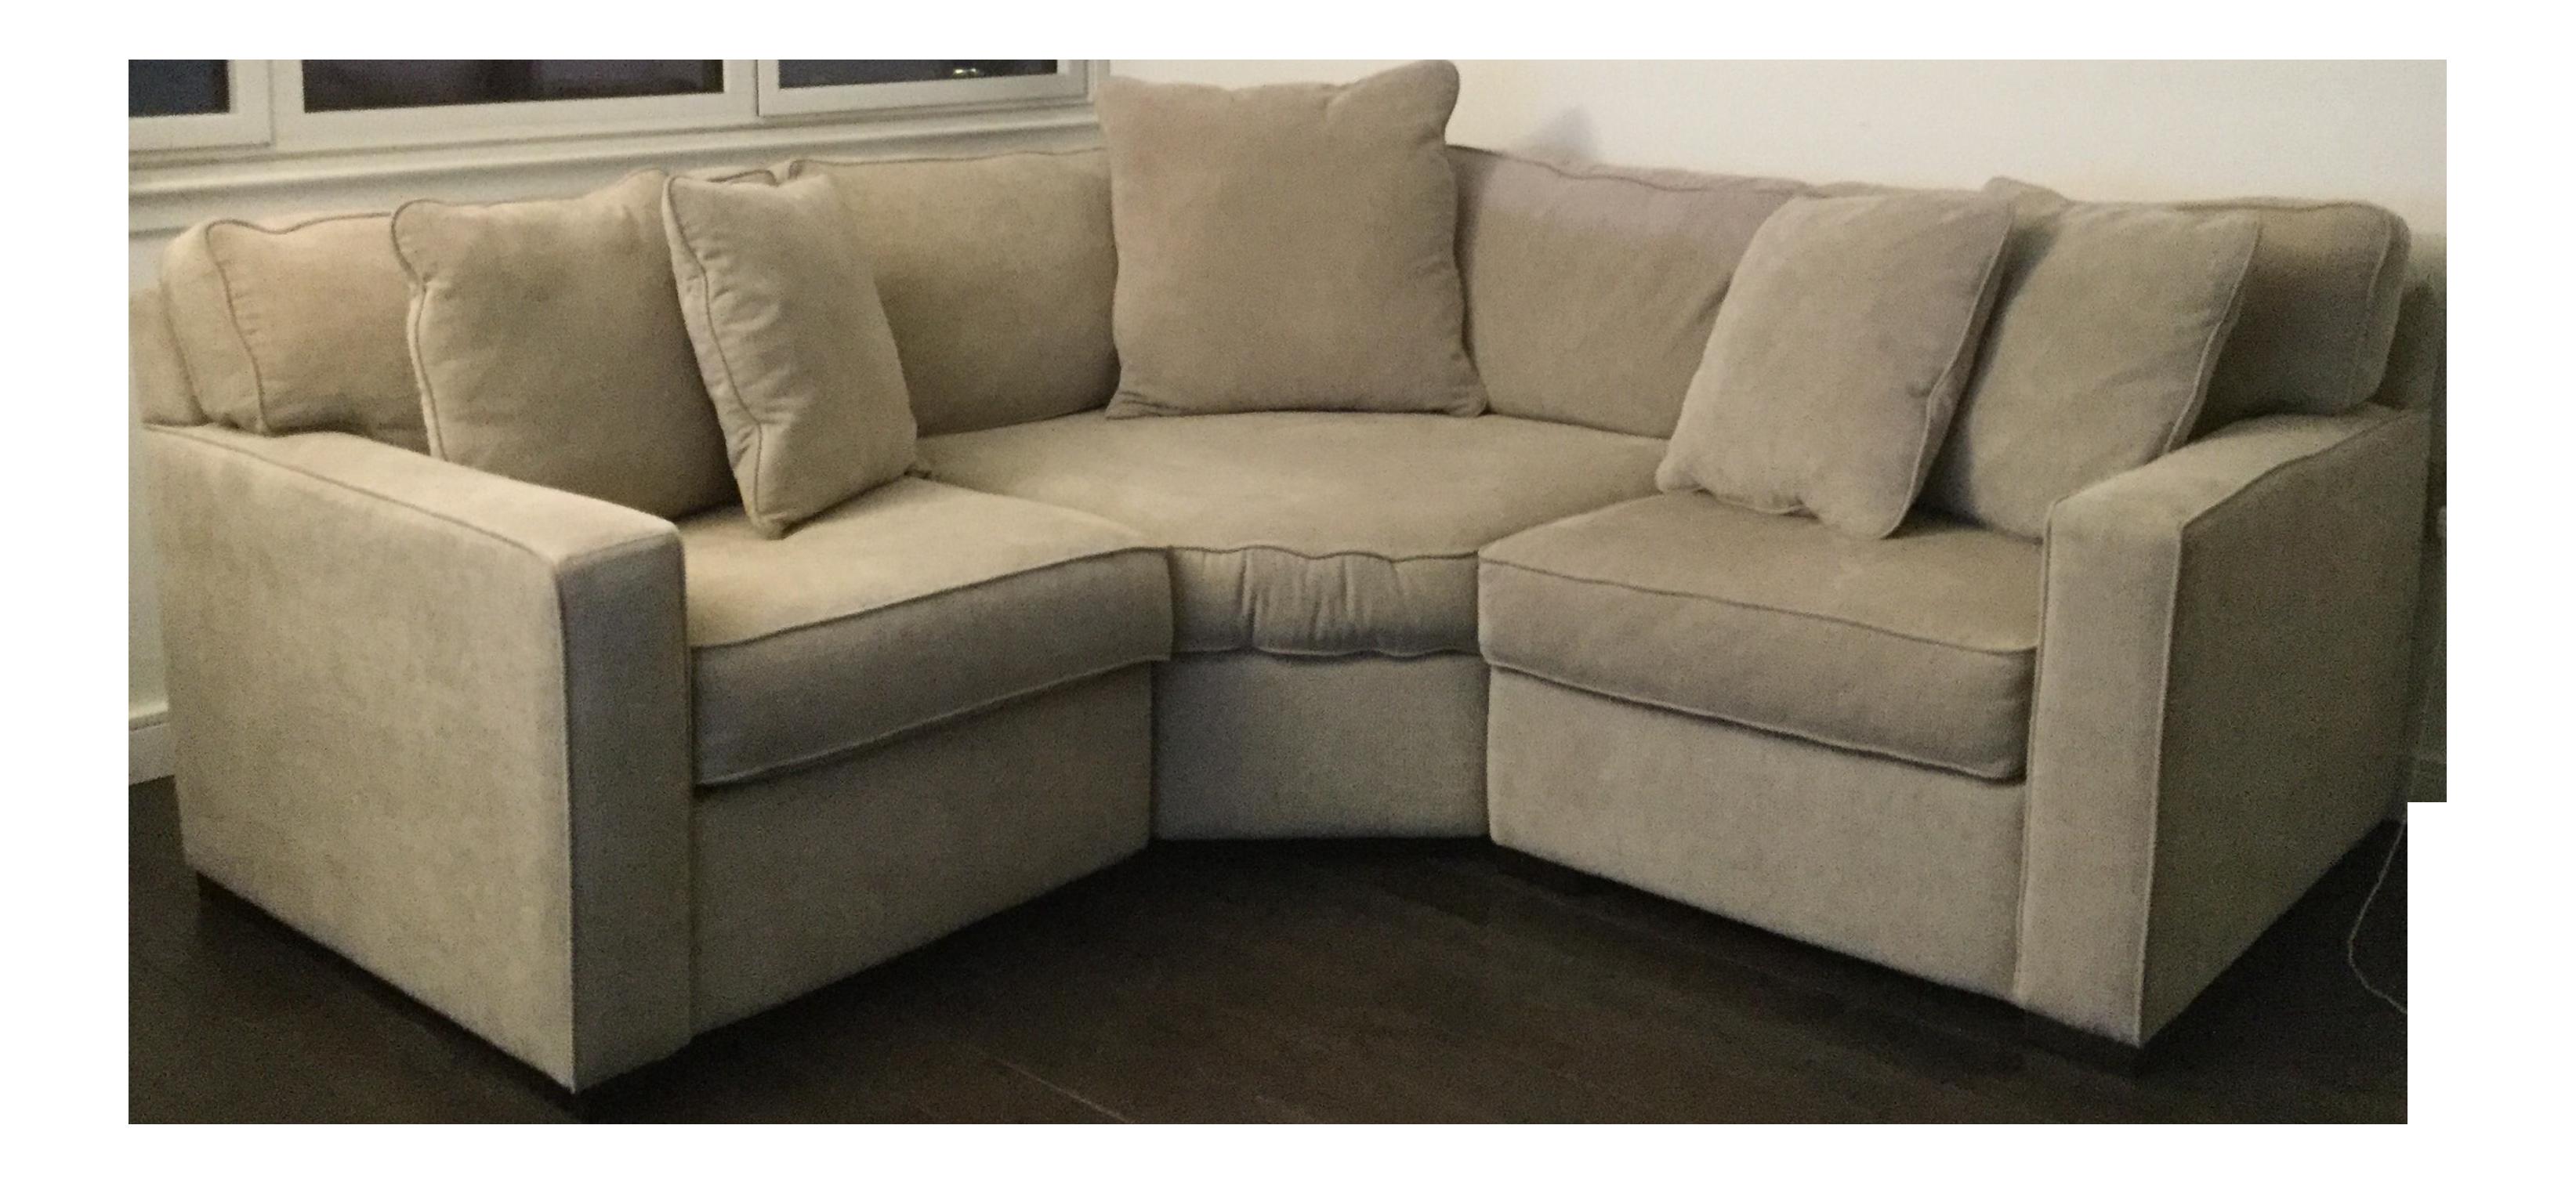 Macys Radley Apartment Sectional Sofa Chairish